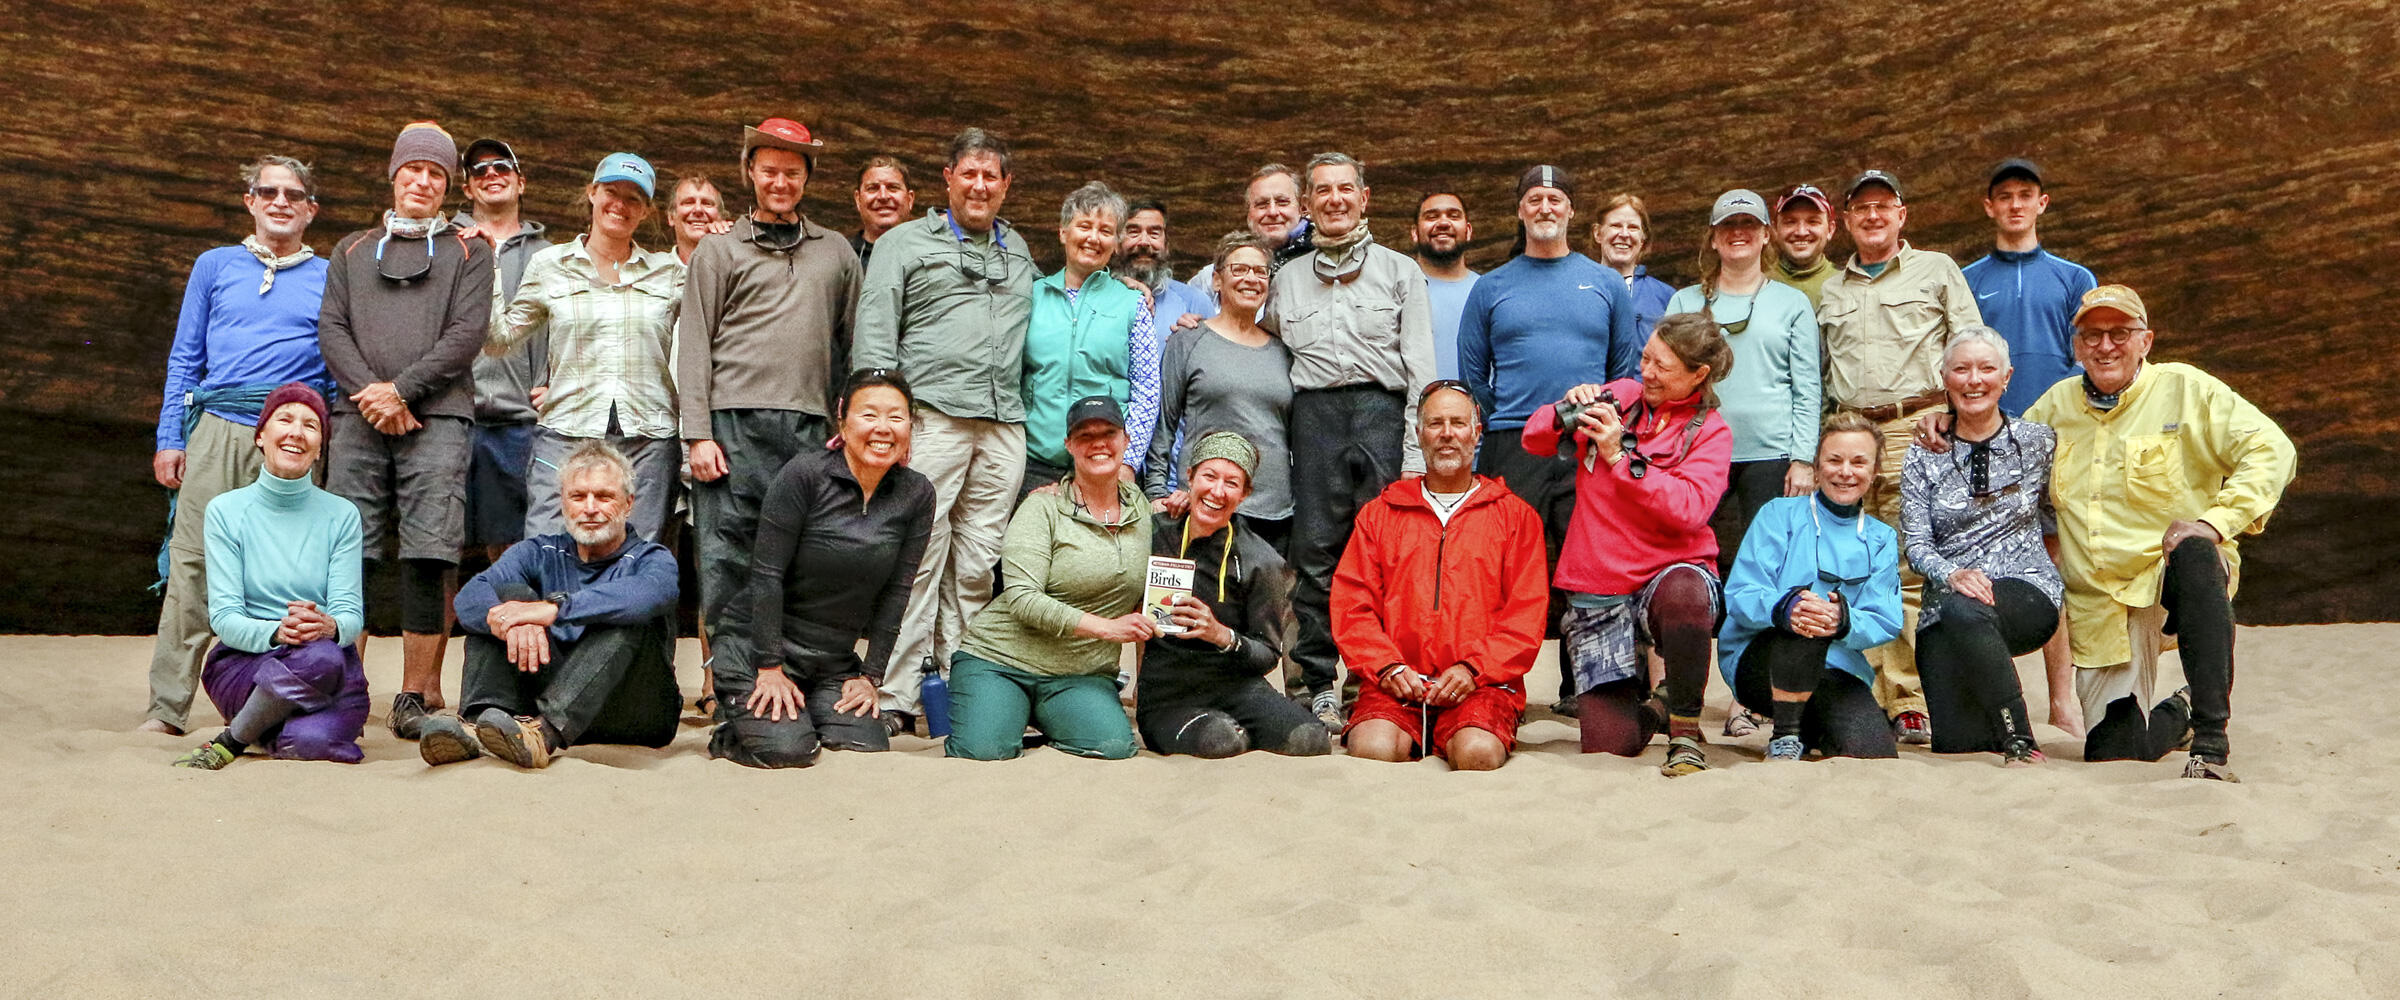 Grand Canyon participants